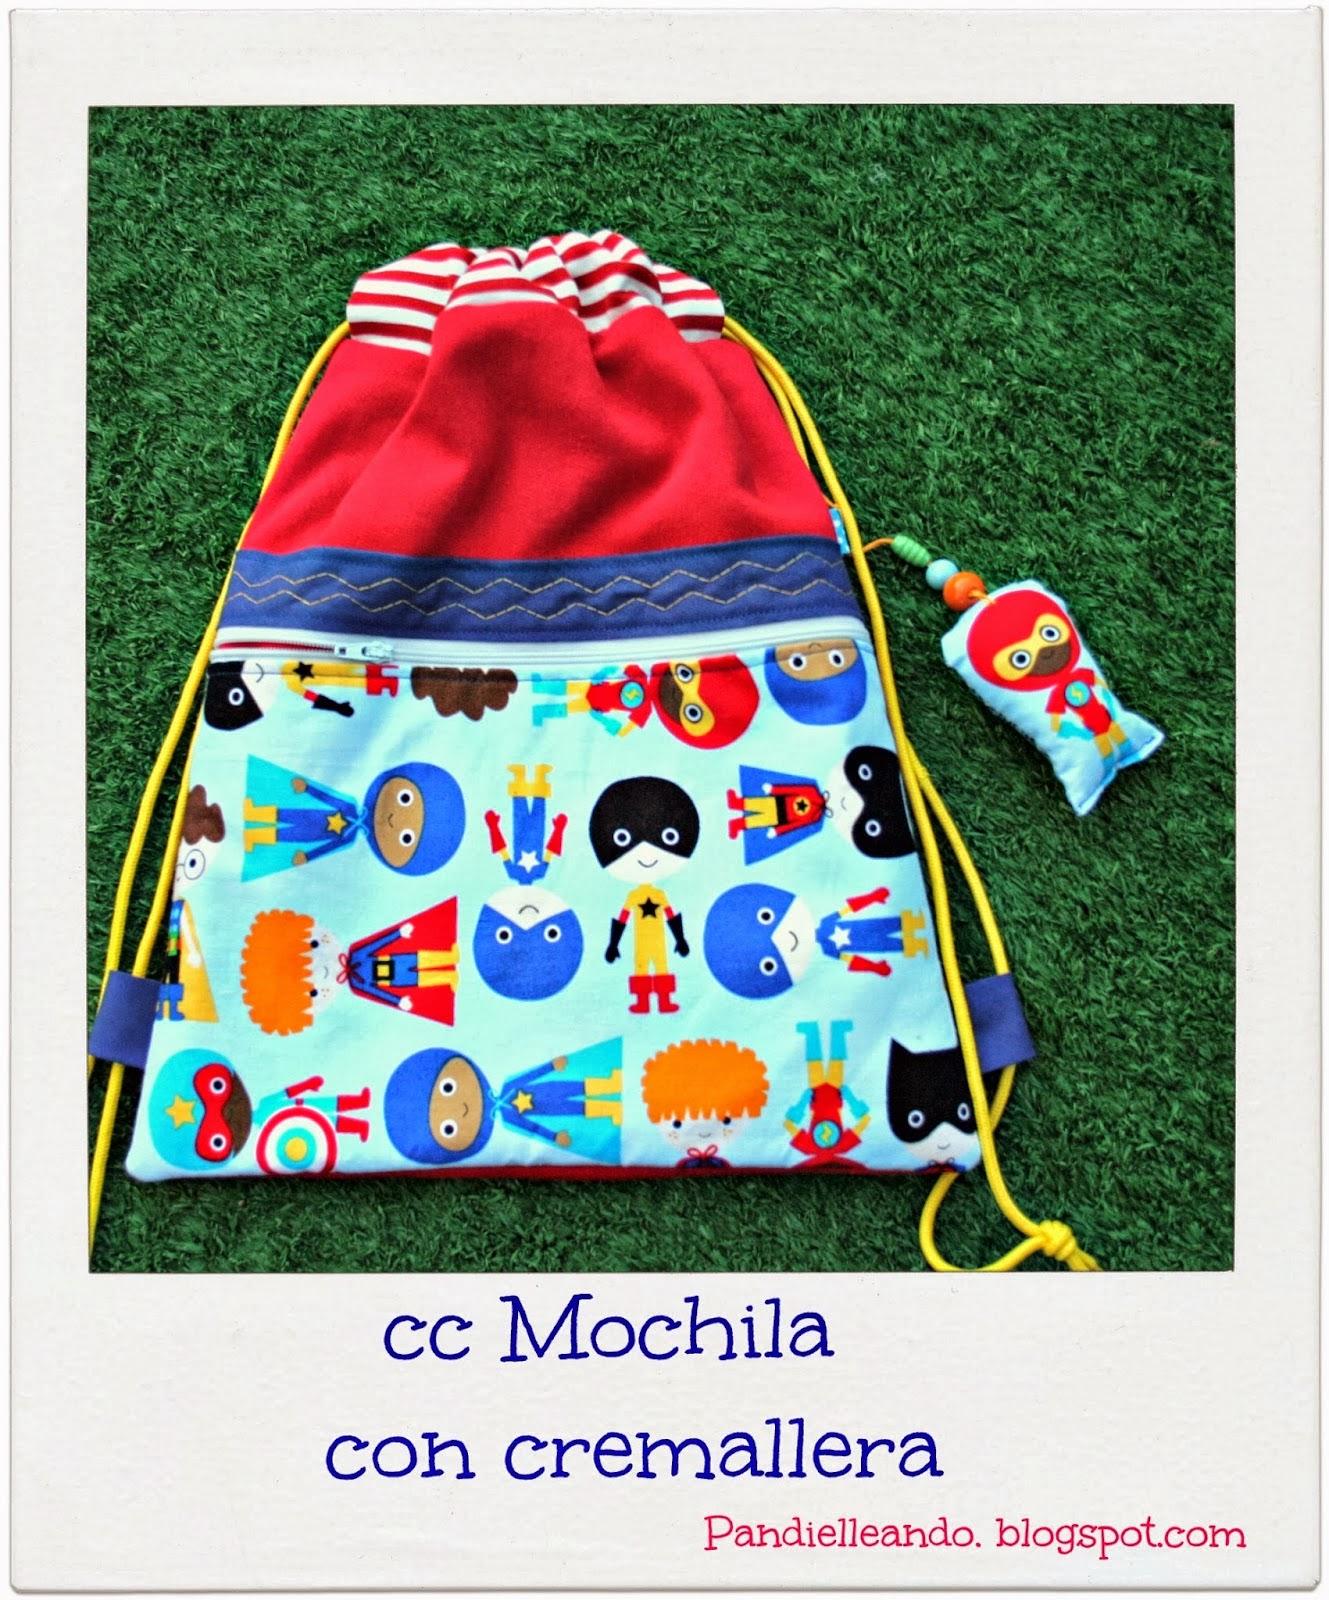 http://pandielleando.blogspot.com.es/2014/02/cc-mochila-con-cremallera-lista-de.html